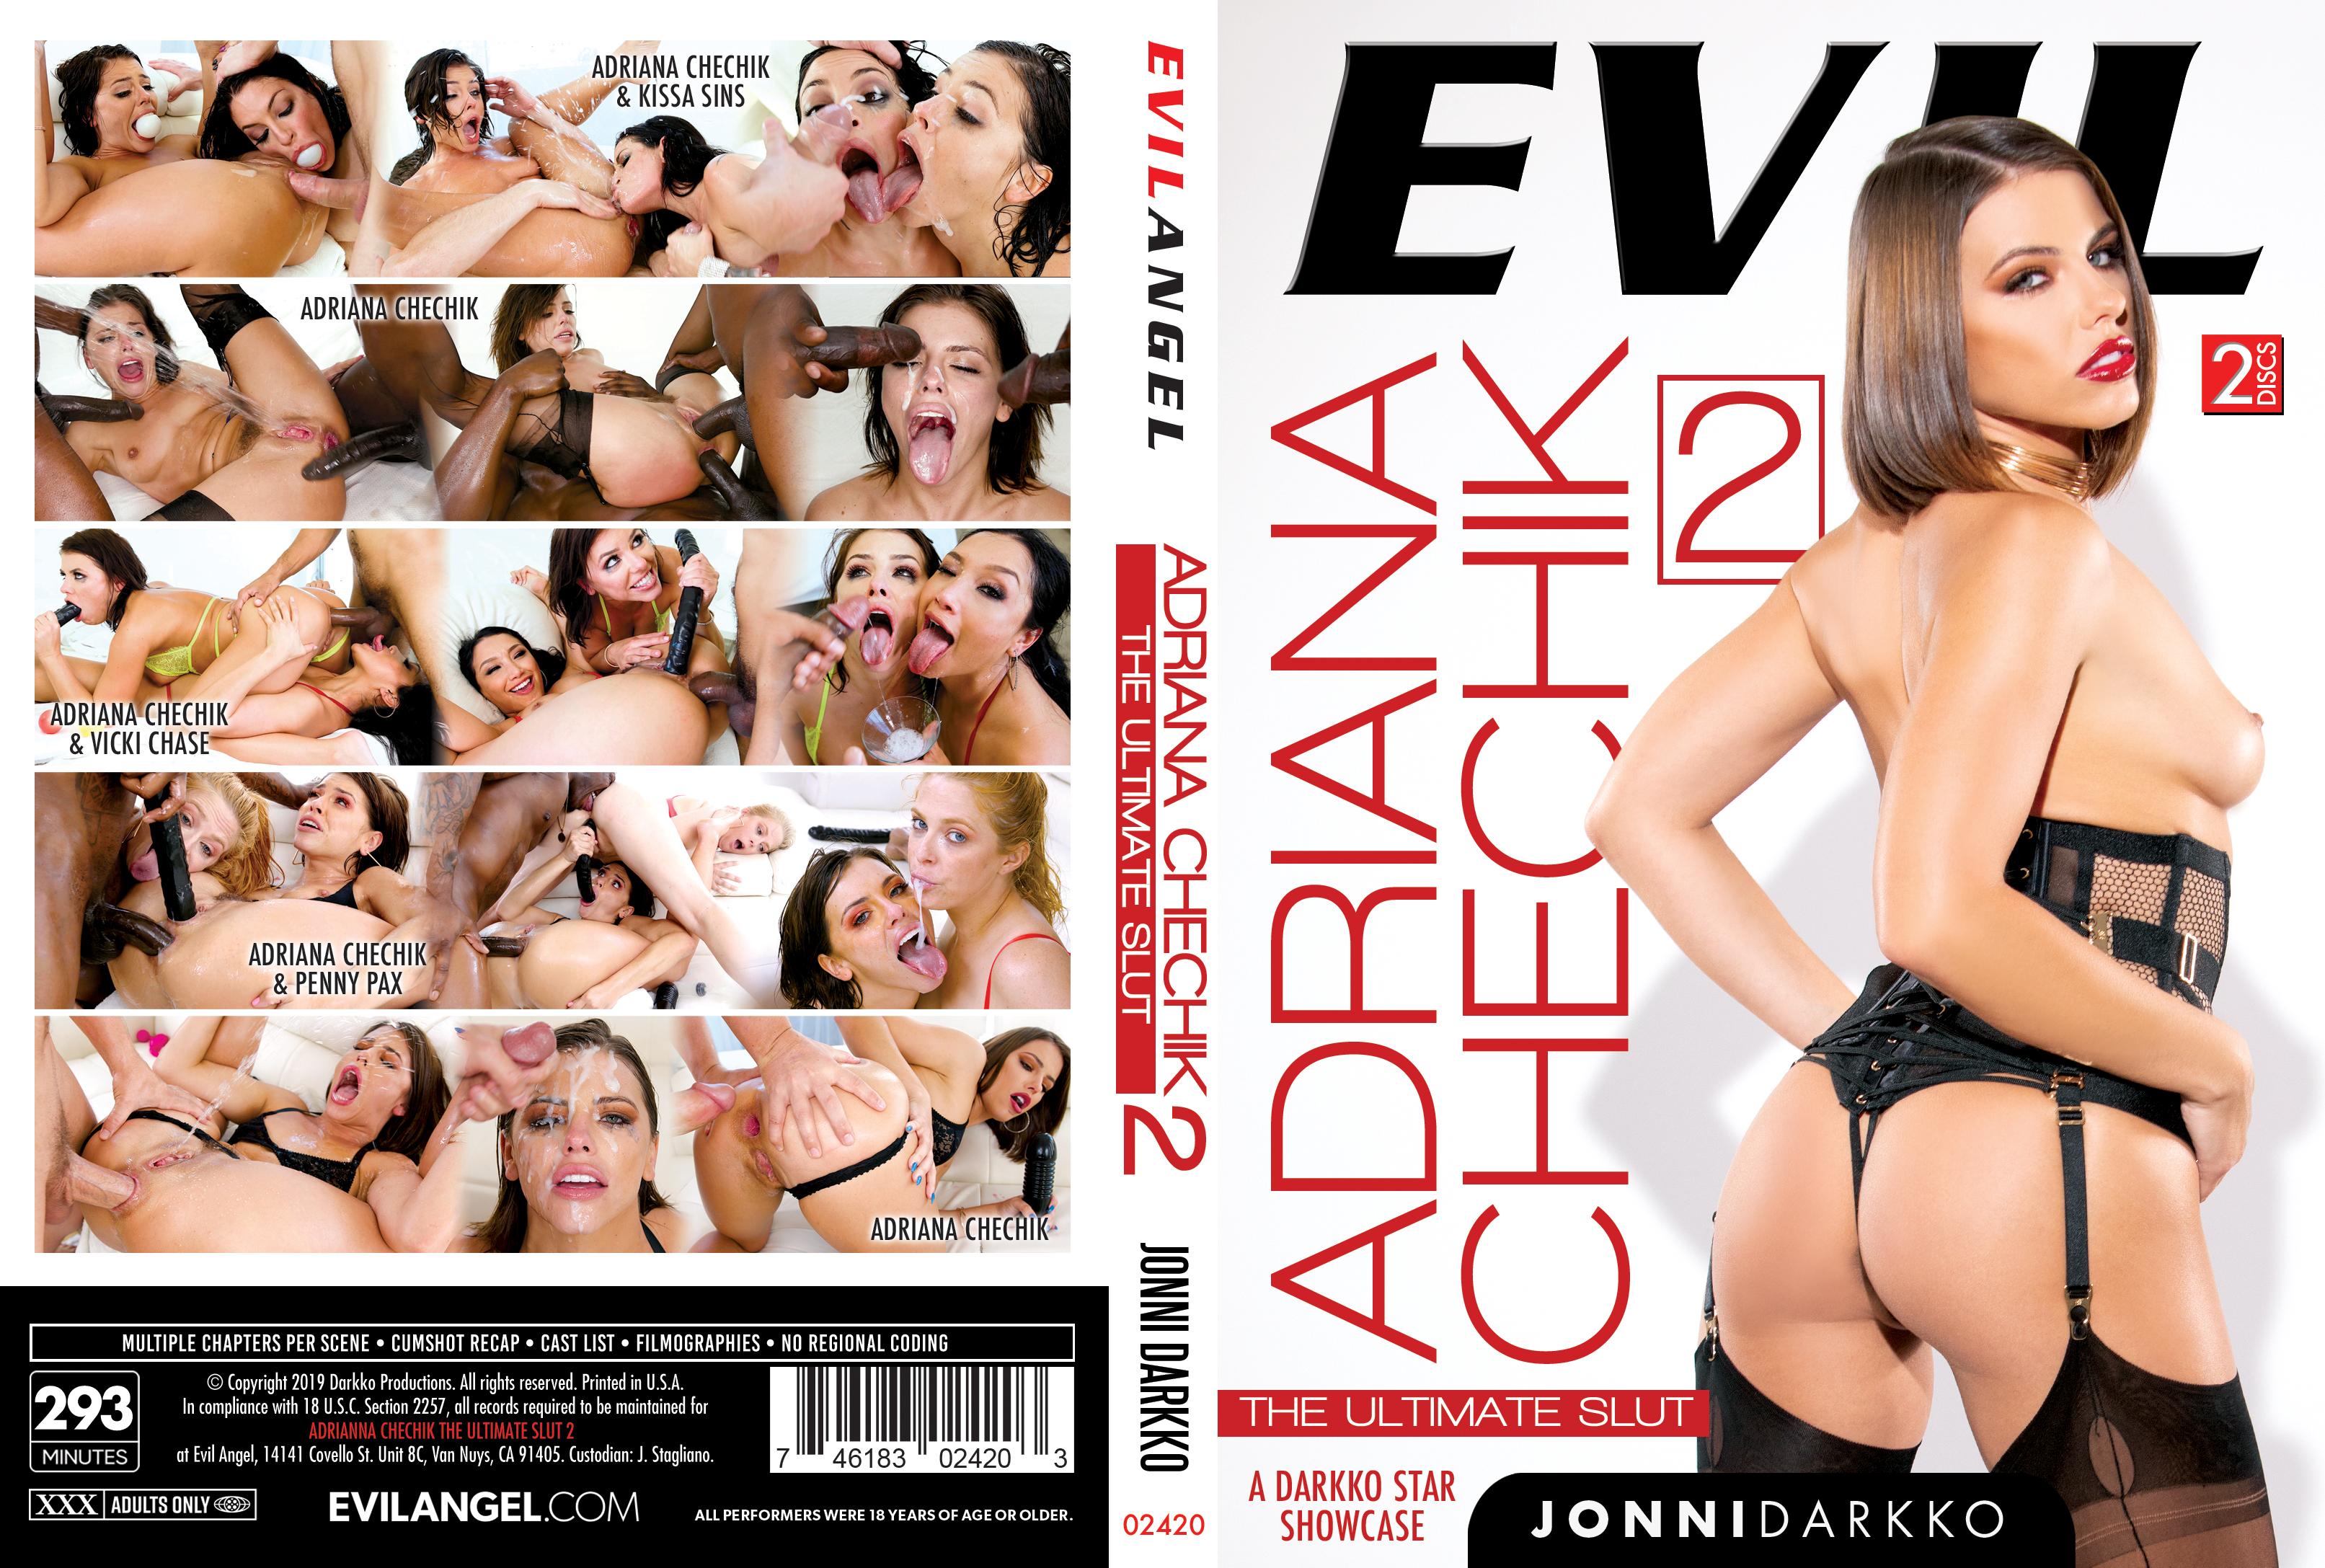 Adriana Chechik The Ultimate Slut porn review darkko productions evil angels adriana chechik